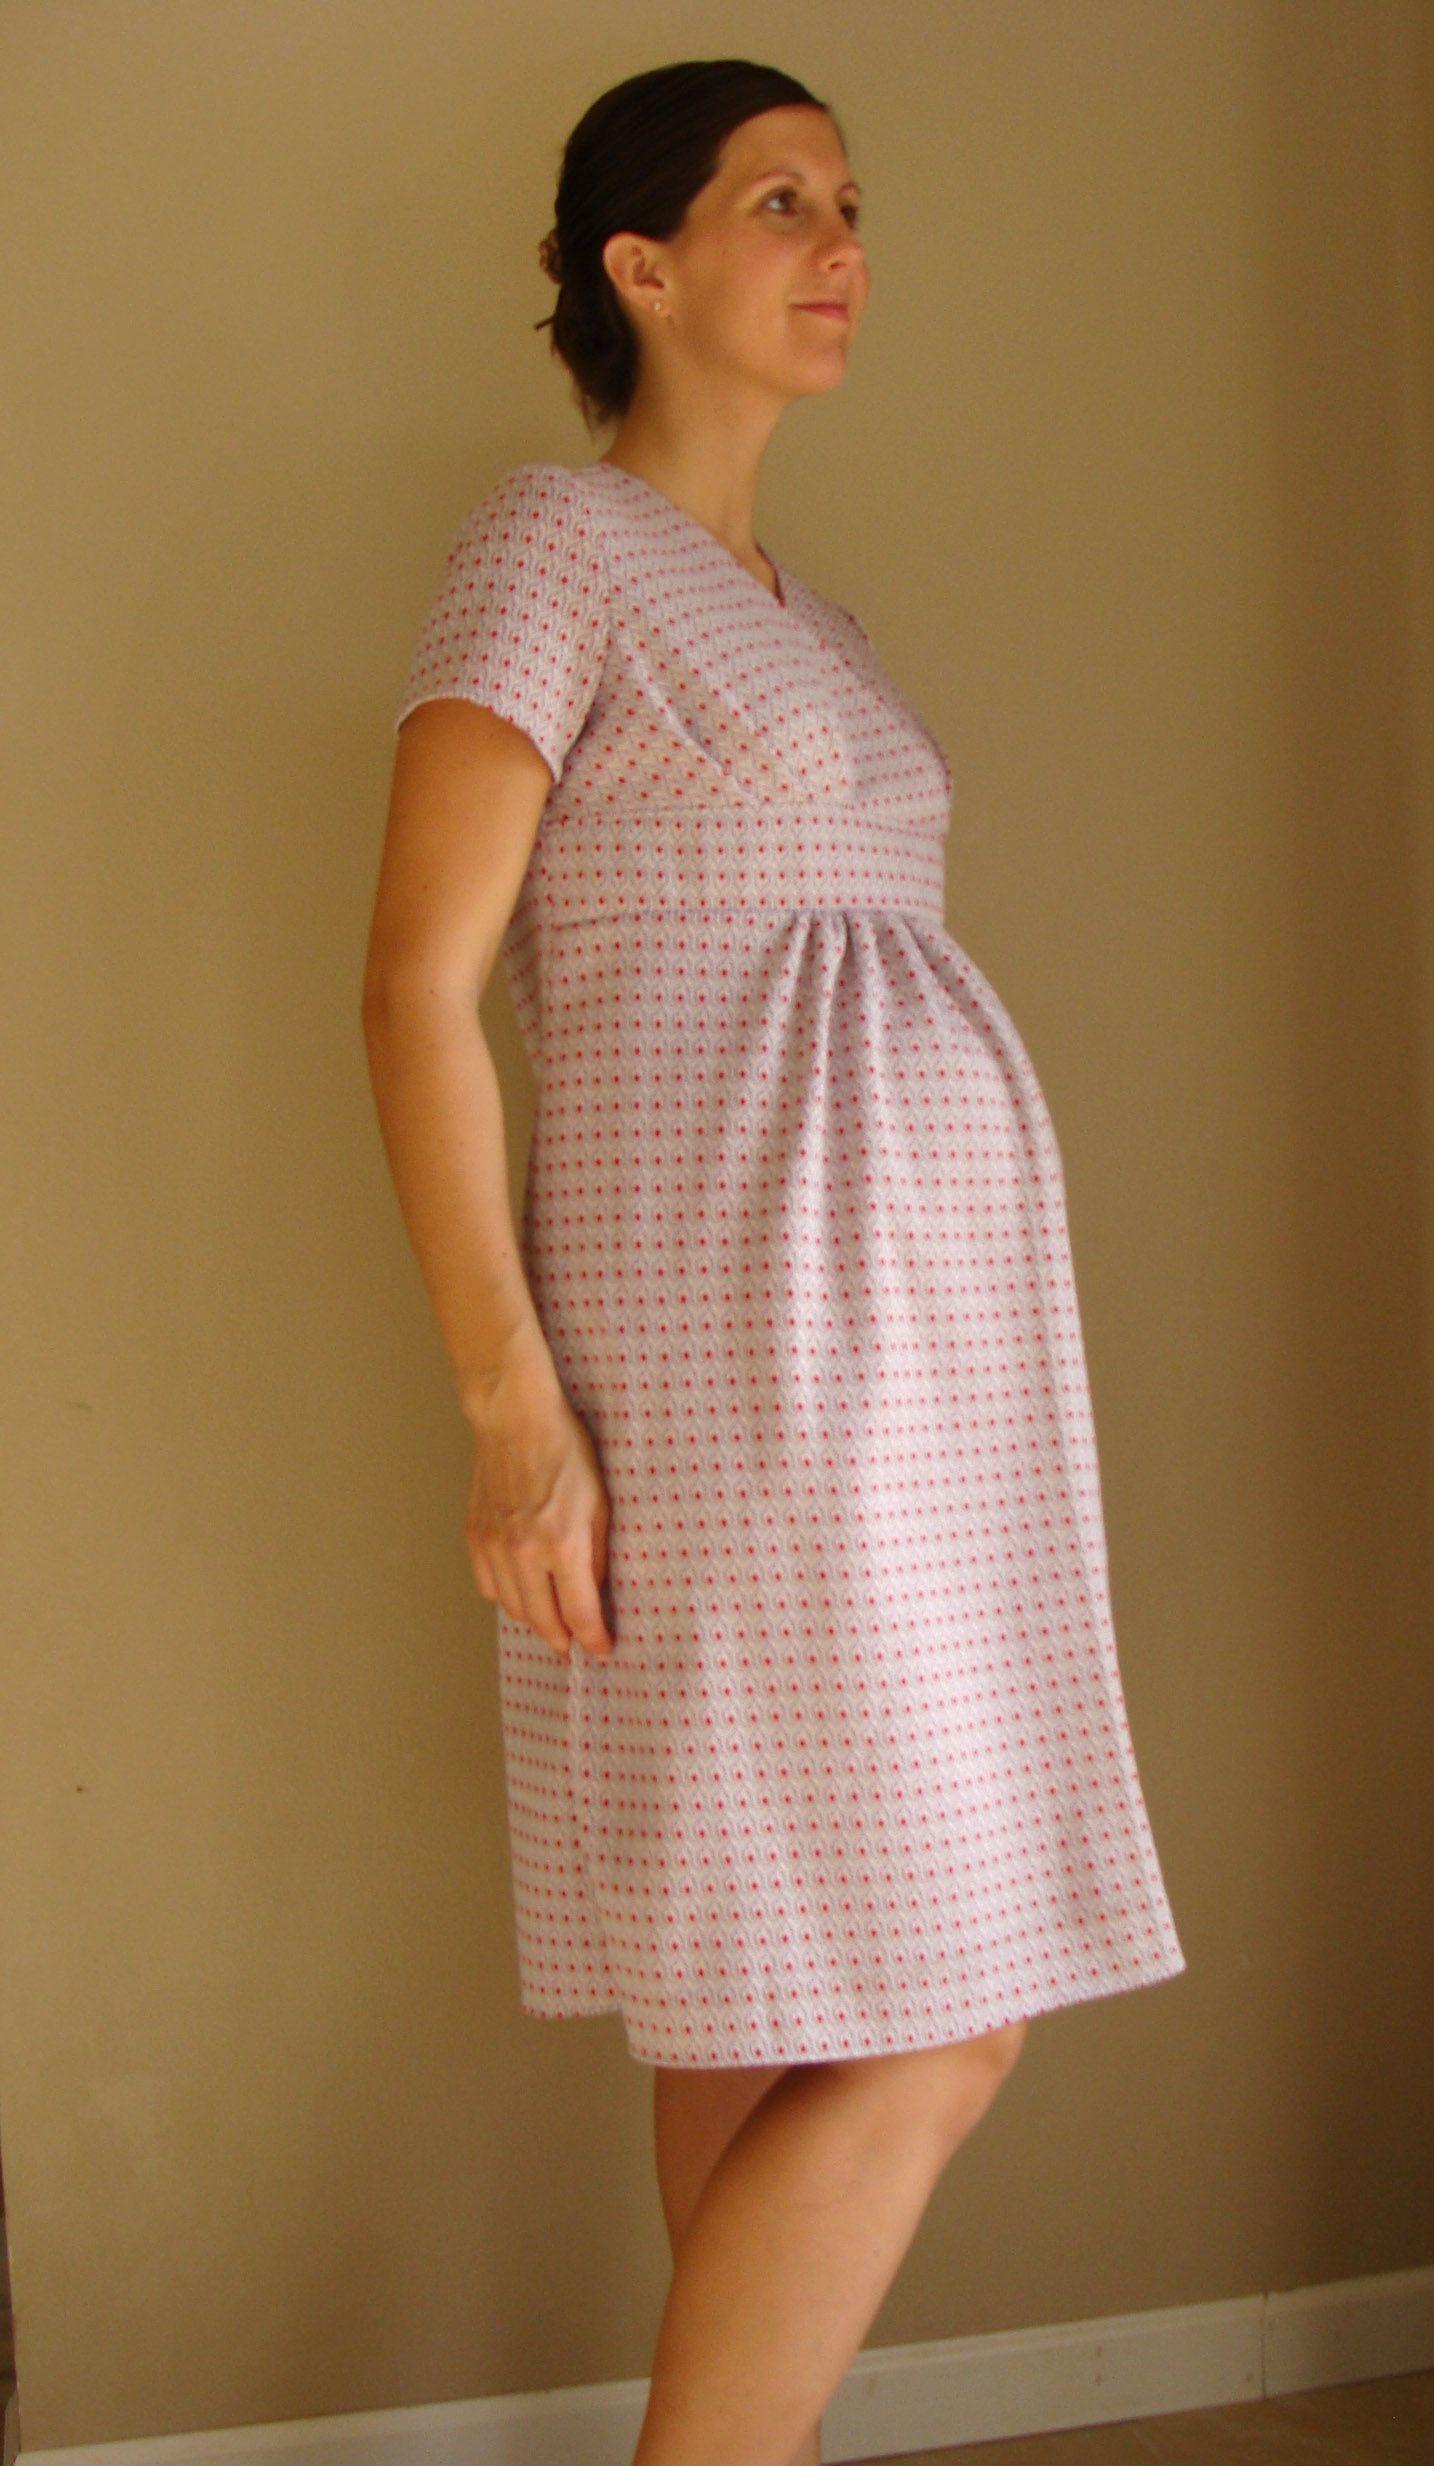 2b7a6cd9edc86 Retro 70s style Maternity Dress size 6/8 -- Ready Made | Things I ...